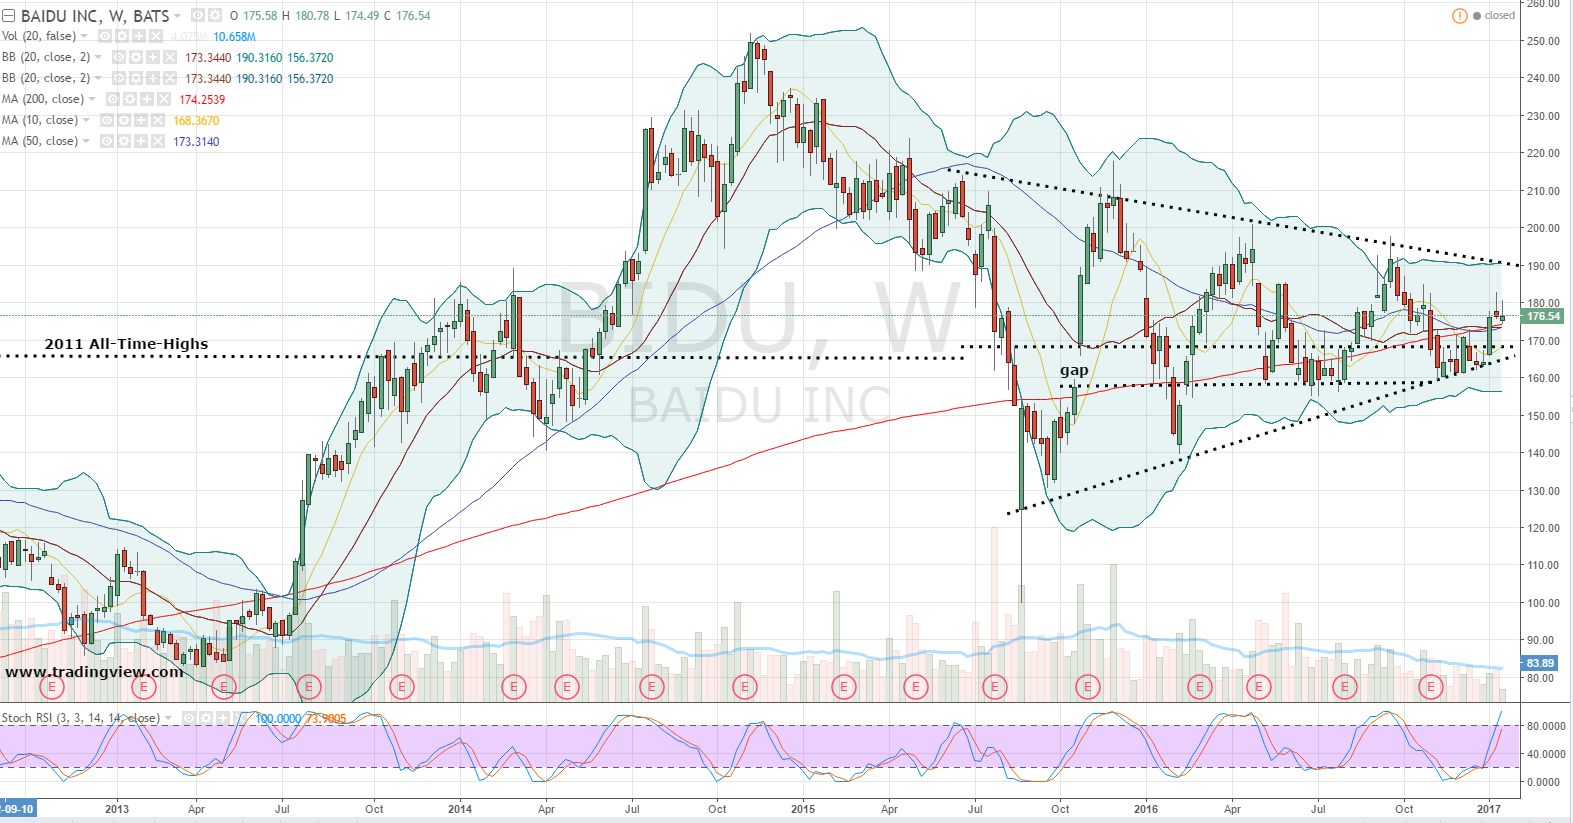 Baidu Stock Quote Buy Baidu Inc Adr Bidu Stock On Pullback For 400% Upside